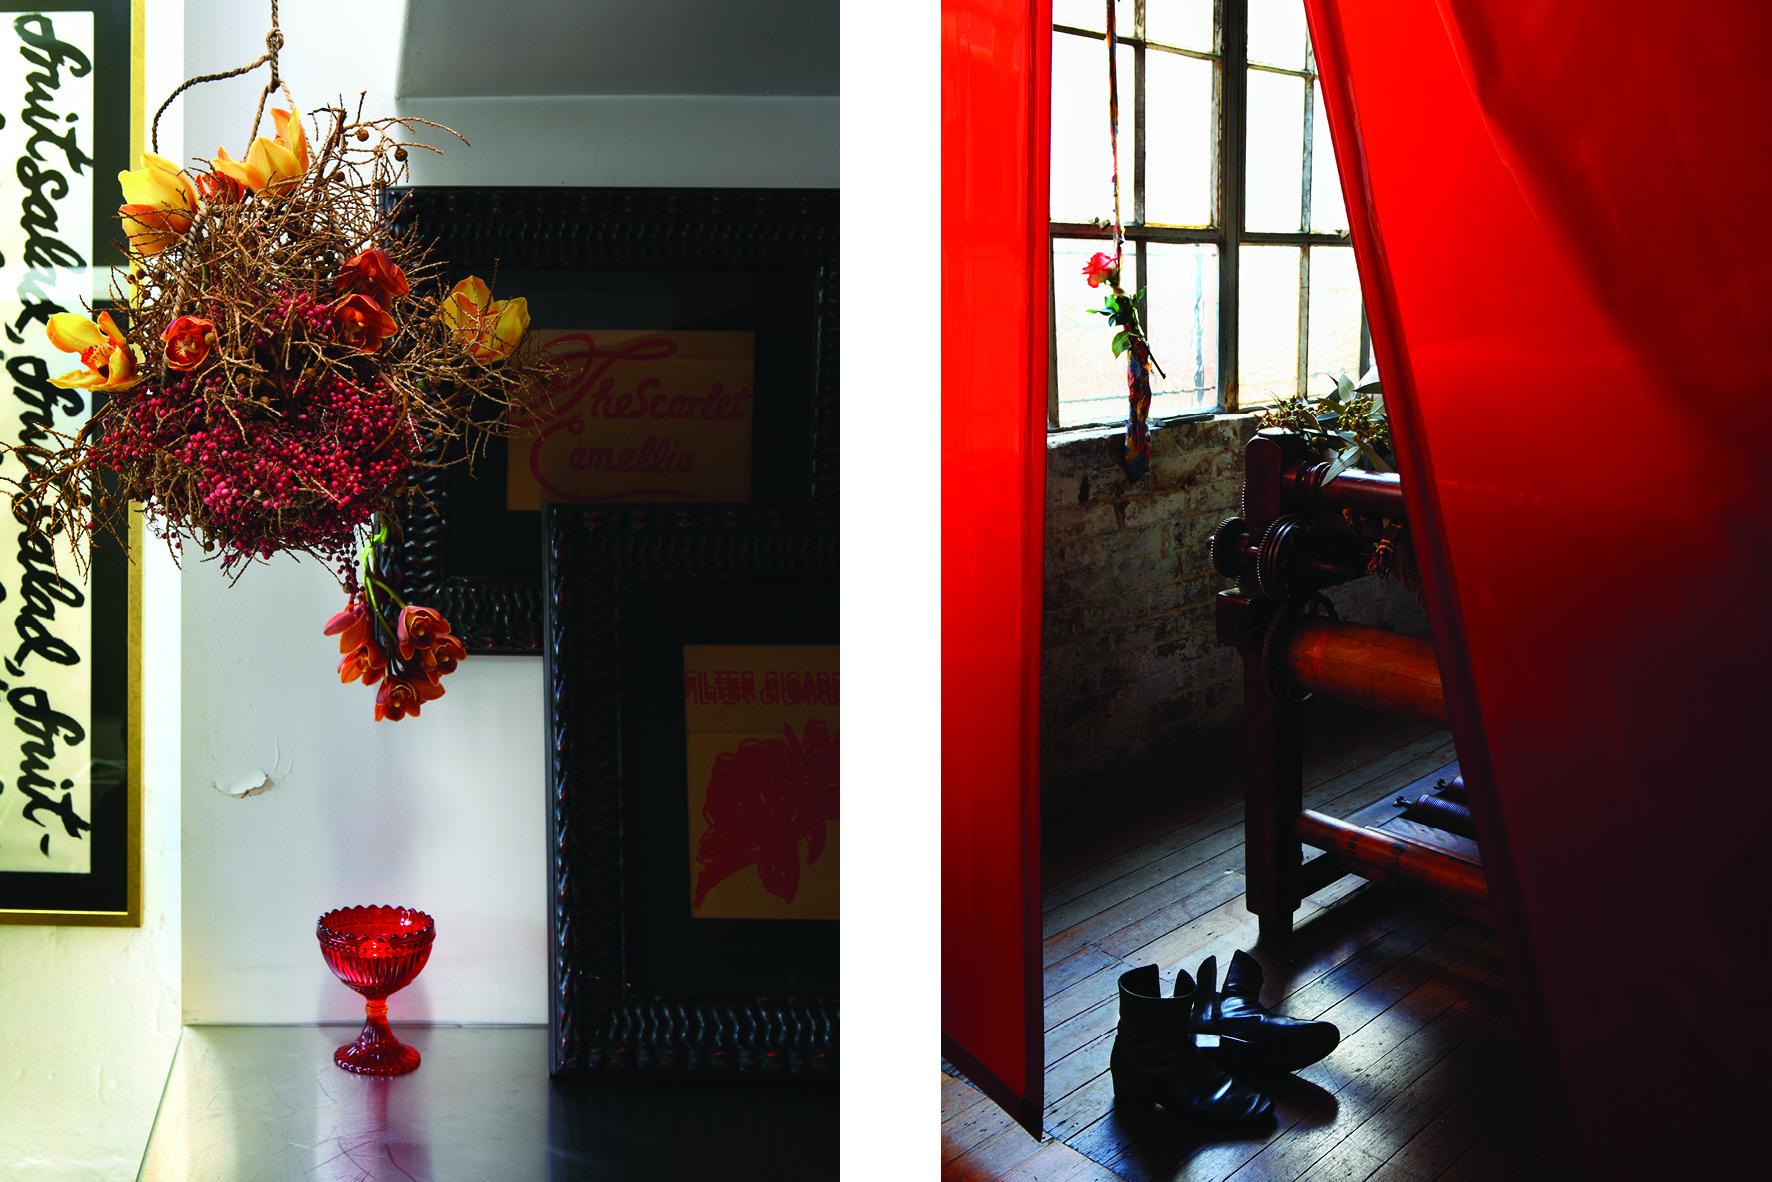 MID_flowers01.jpg